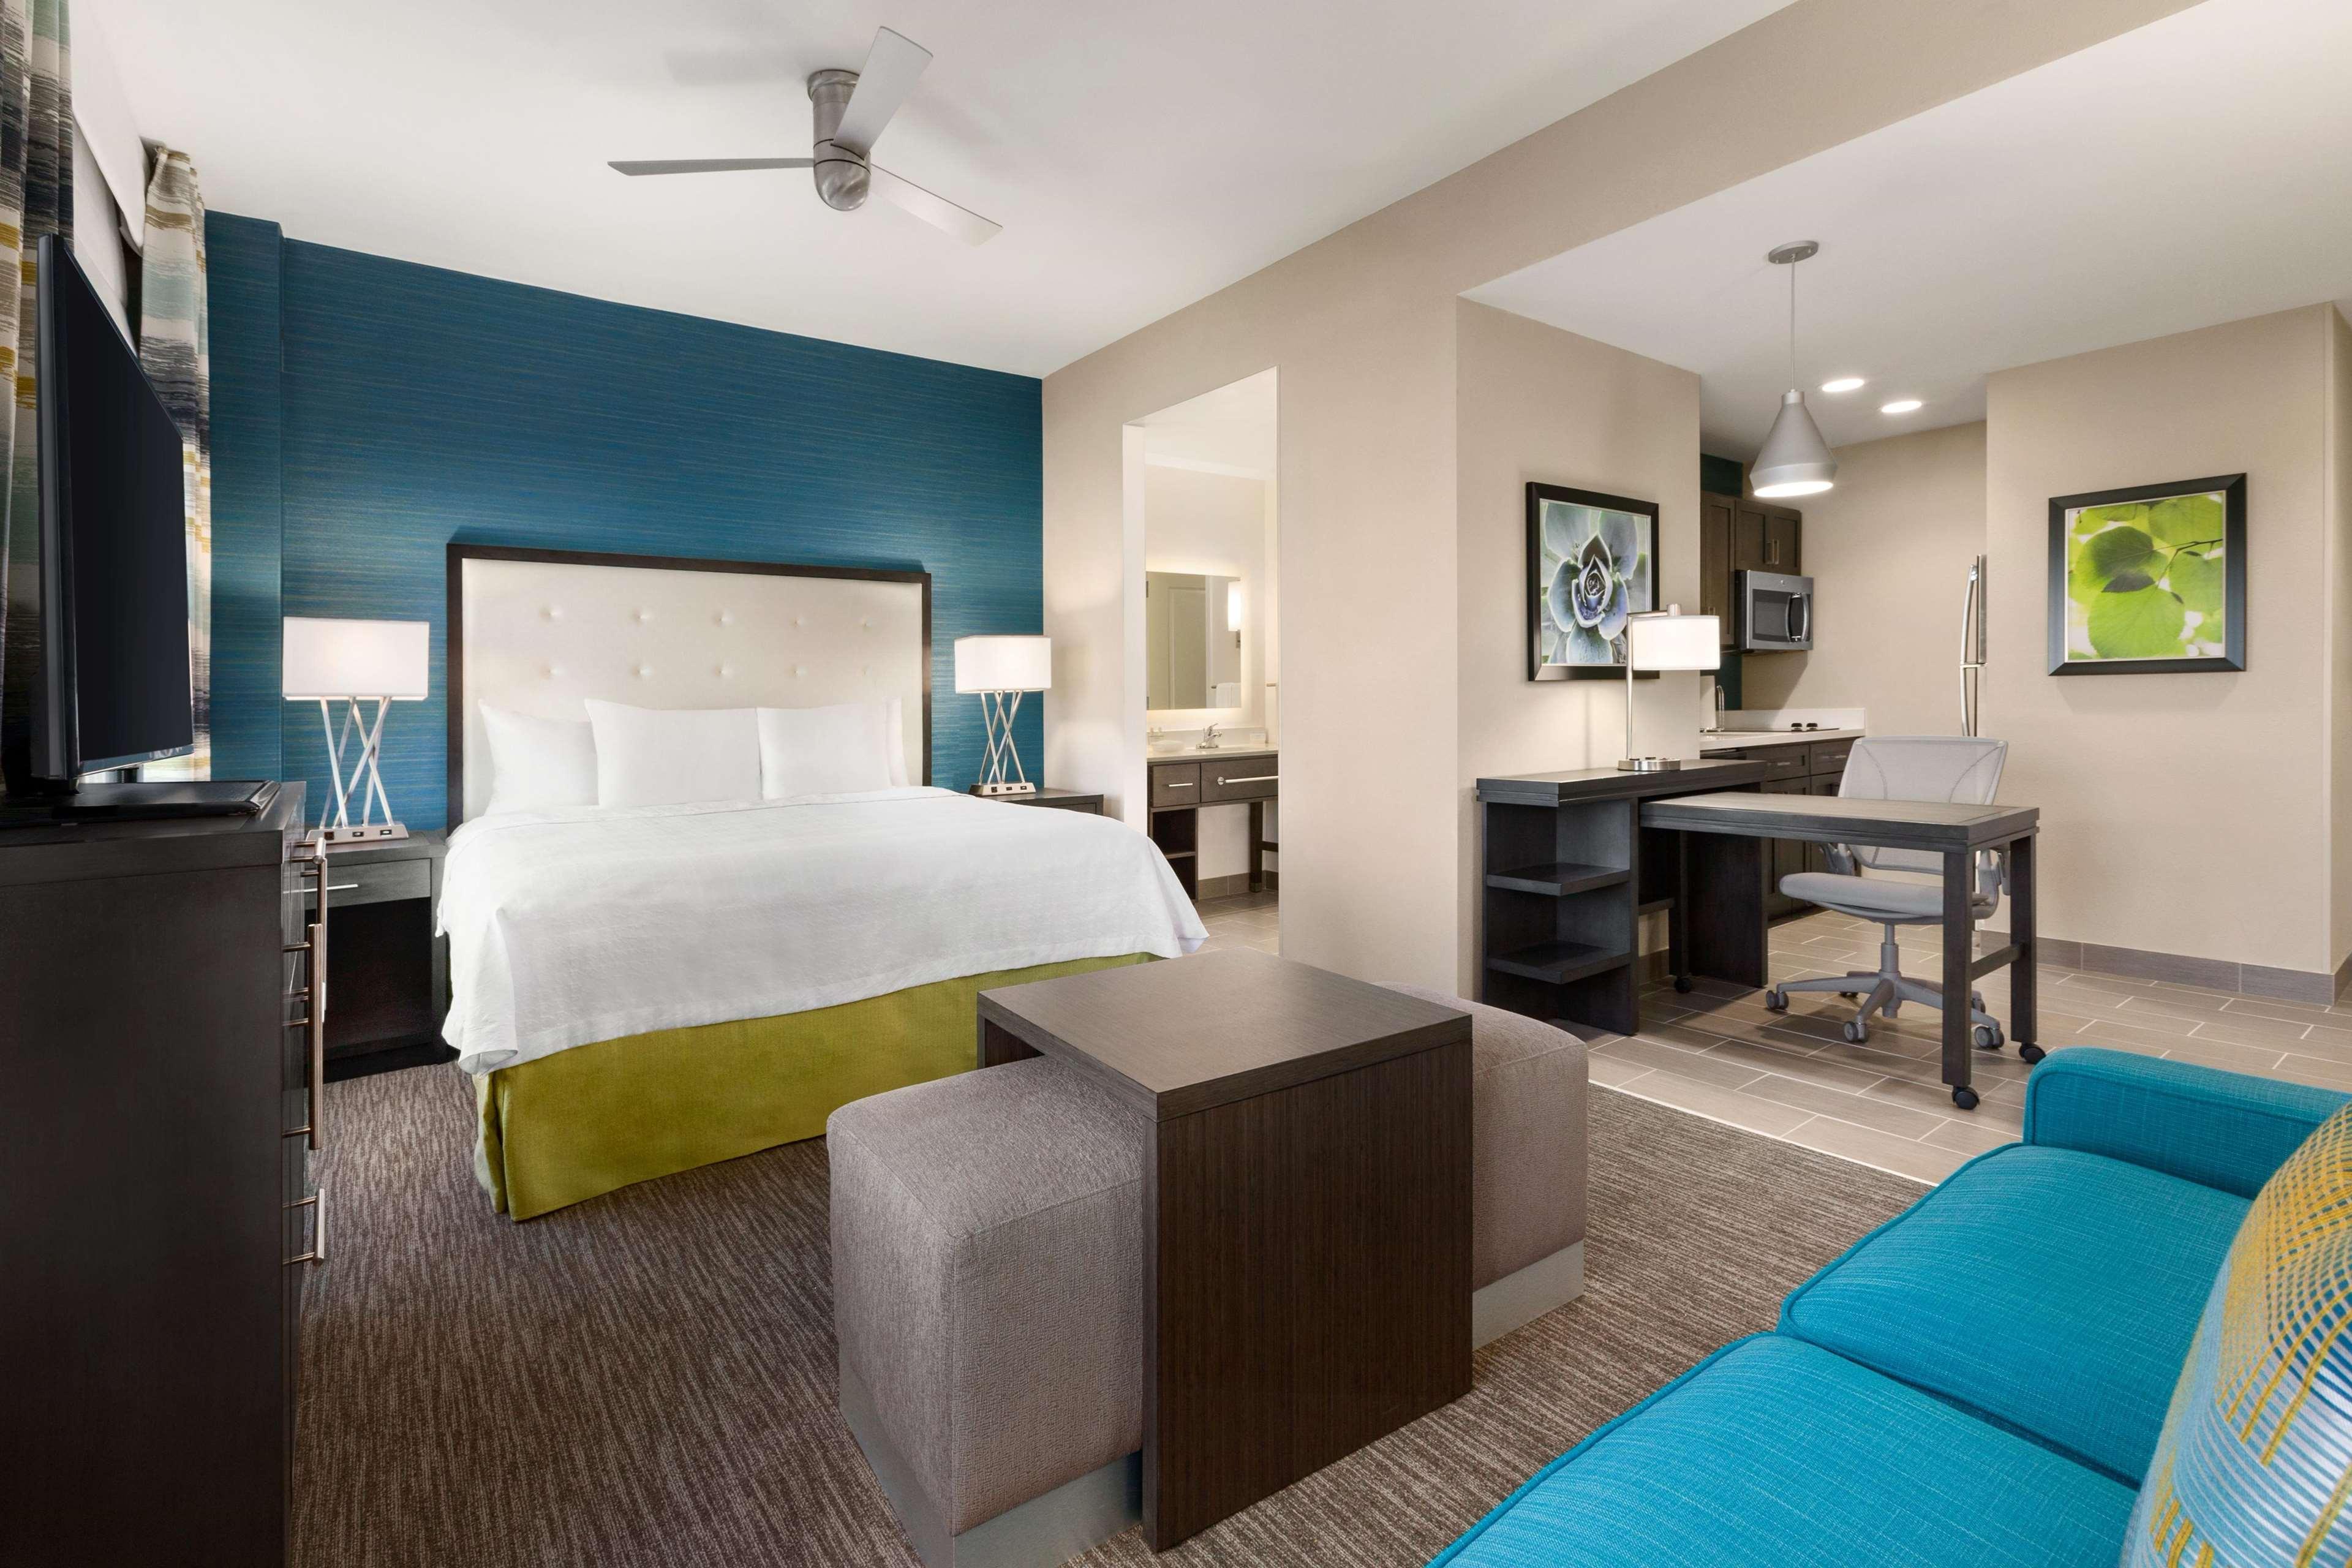 Homewood Suites by Hilton Charlotte/SouthPark image 15